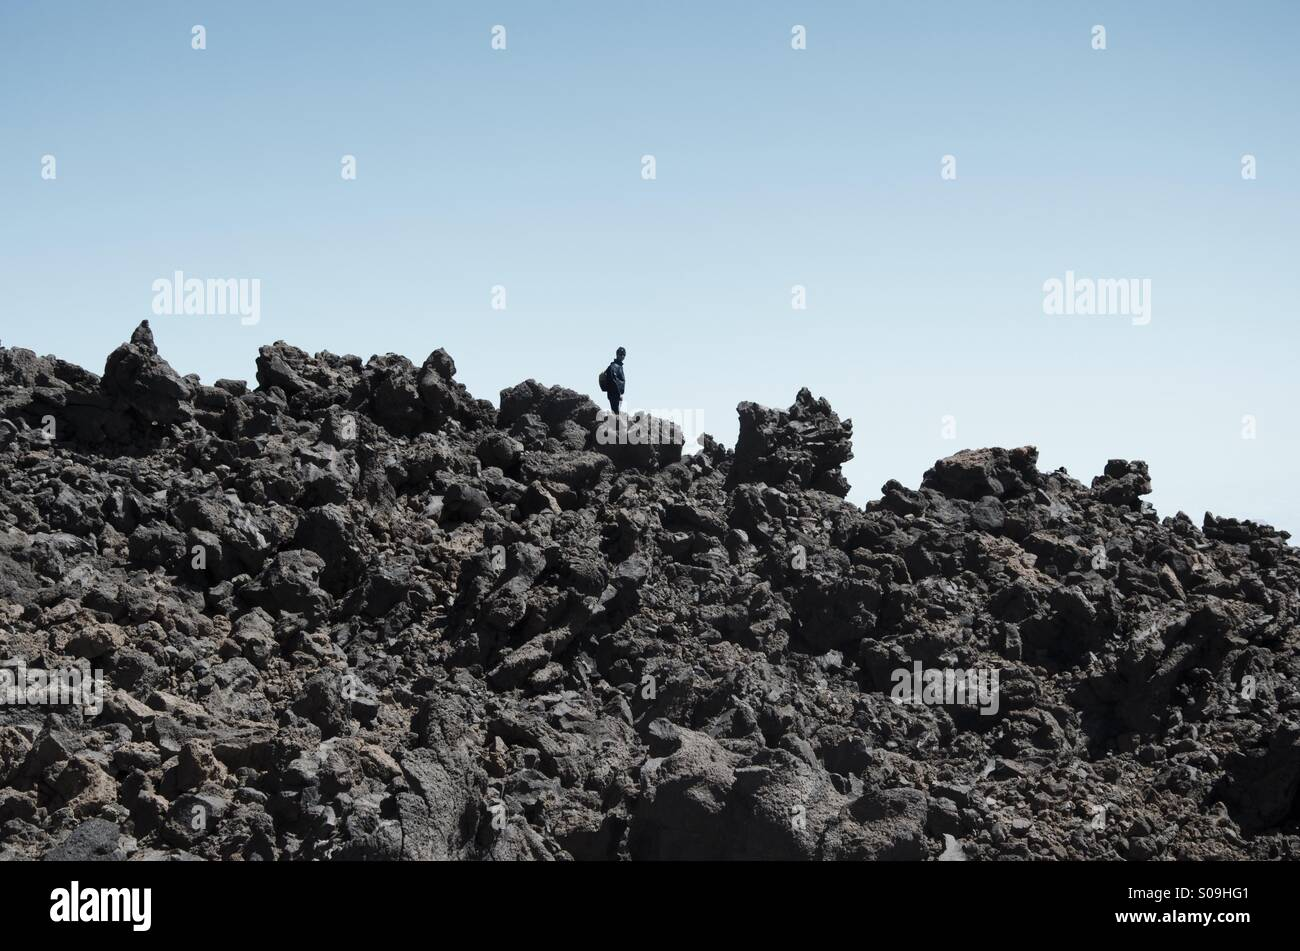 Explorador solitario Imagen De Stock